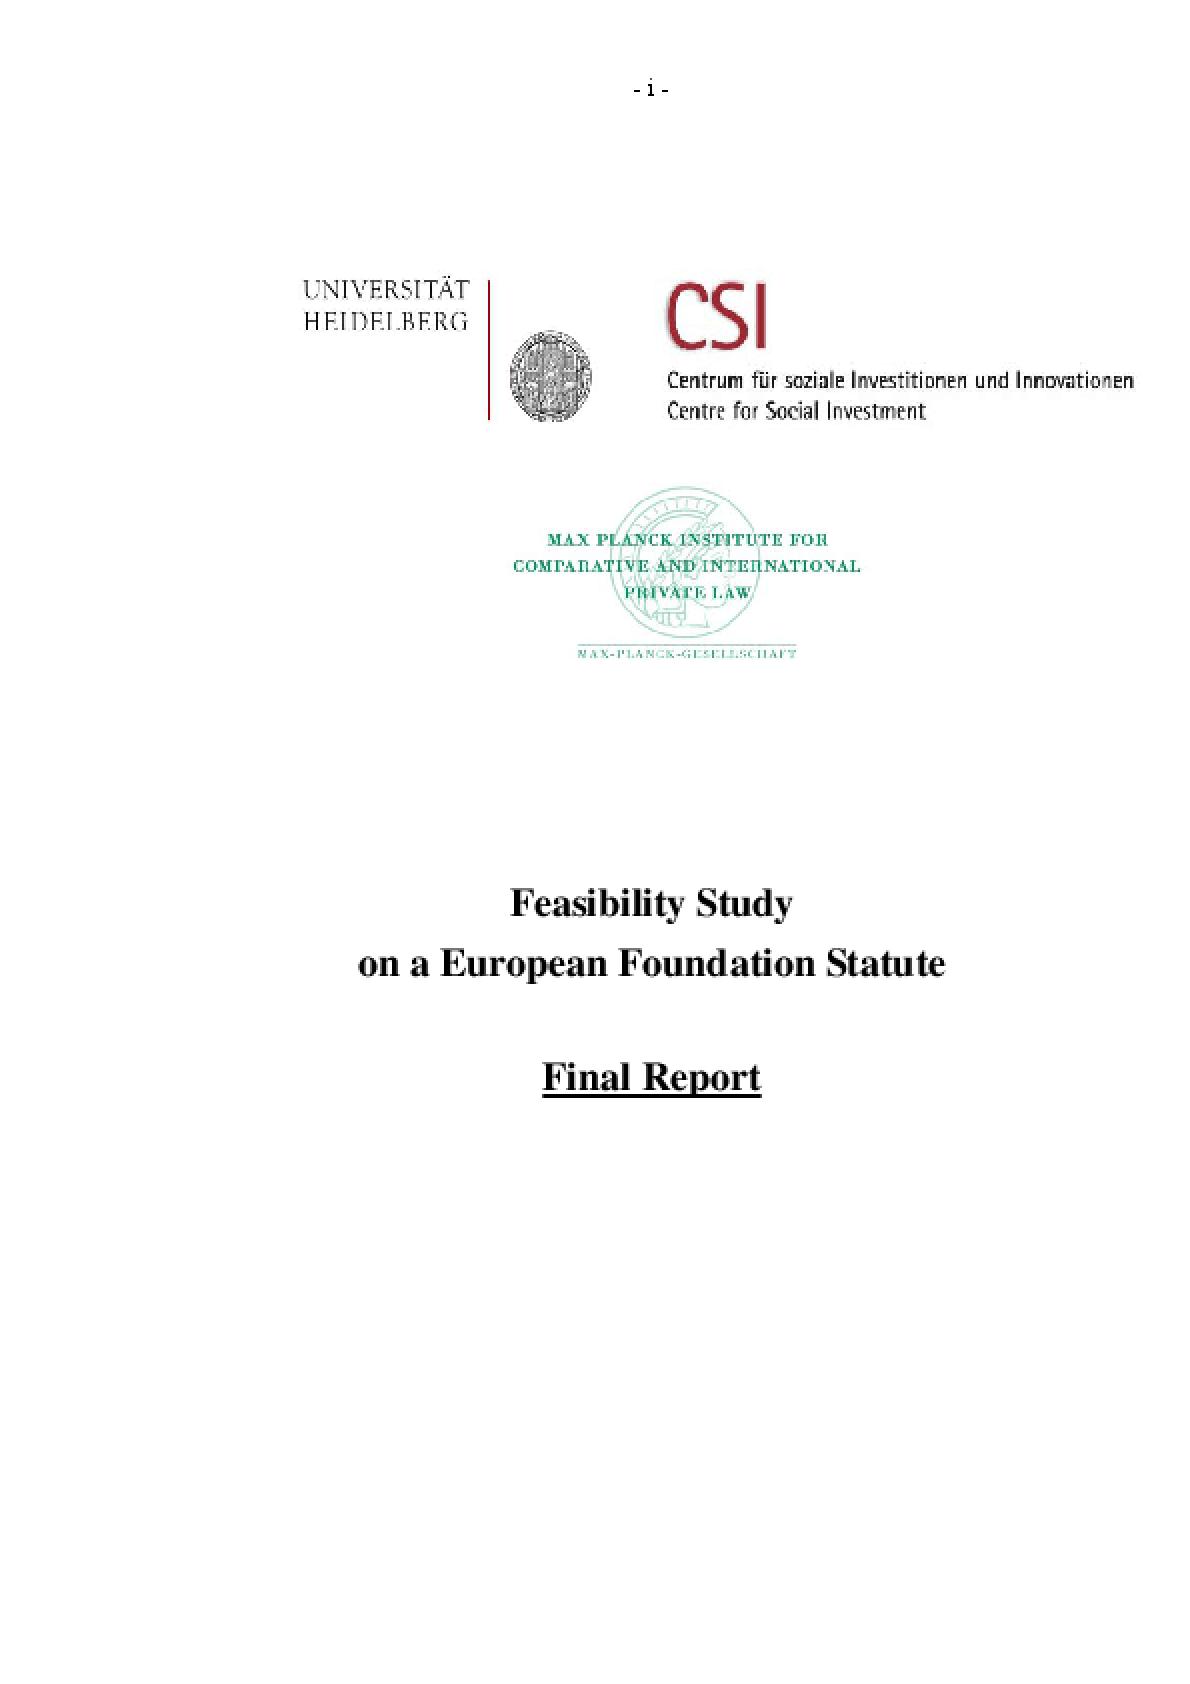 Feasibility Study on a European Foundation Statute: Final Report